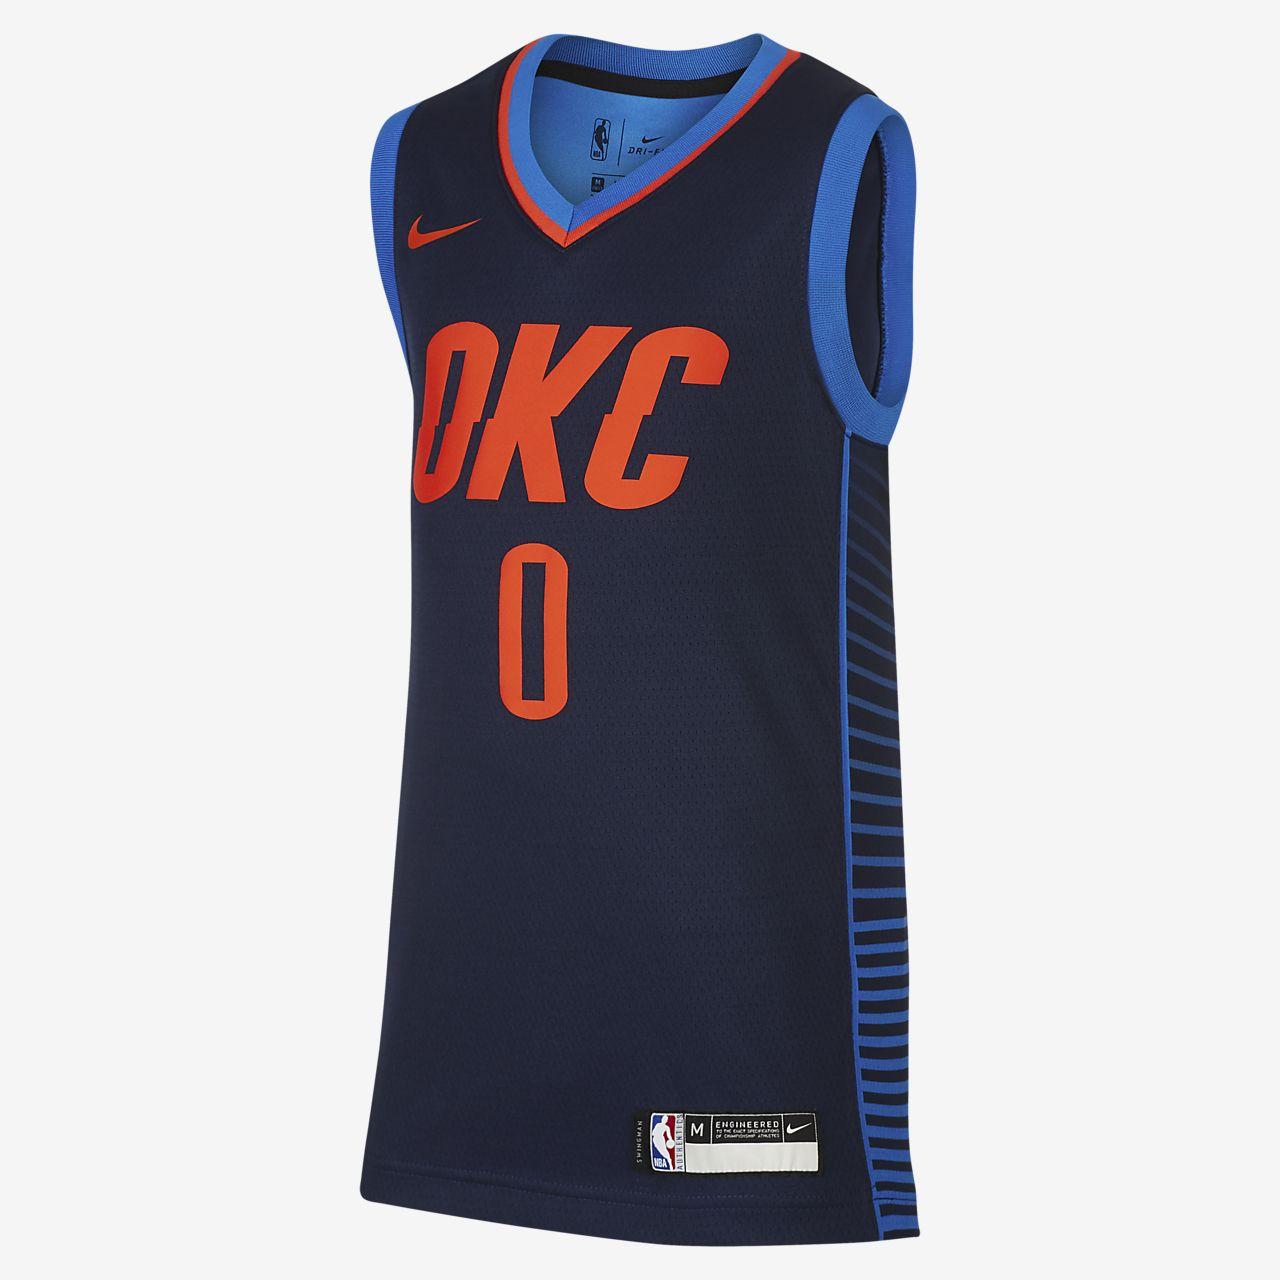 俄克拉荷马城雷霆队 Statement Edition SwingmanNike NBA Jersey大童(男孩)球衣